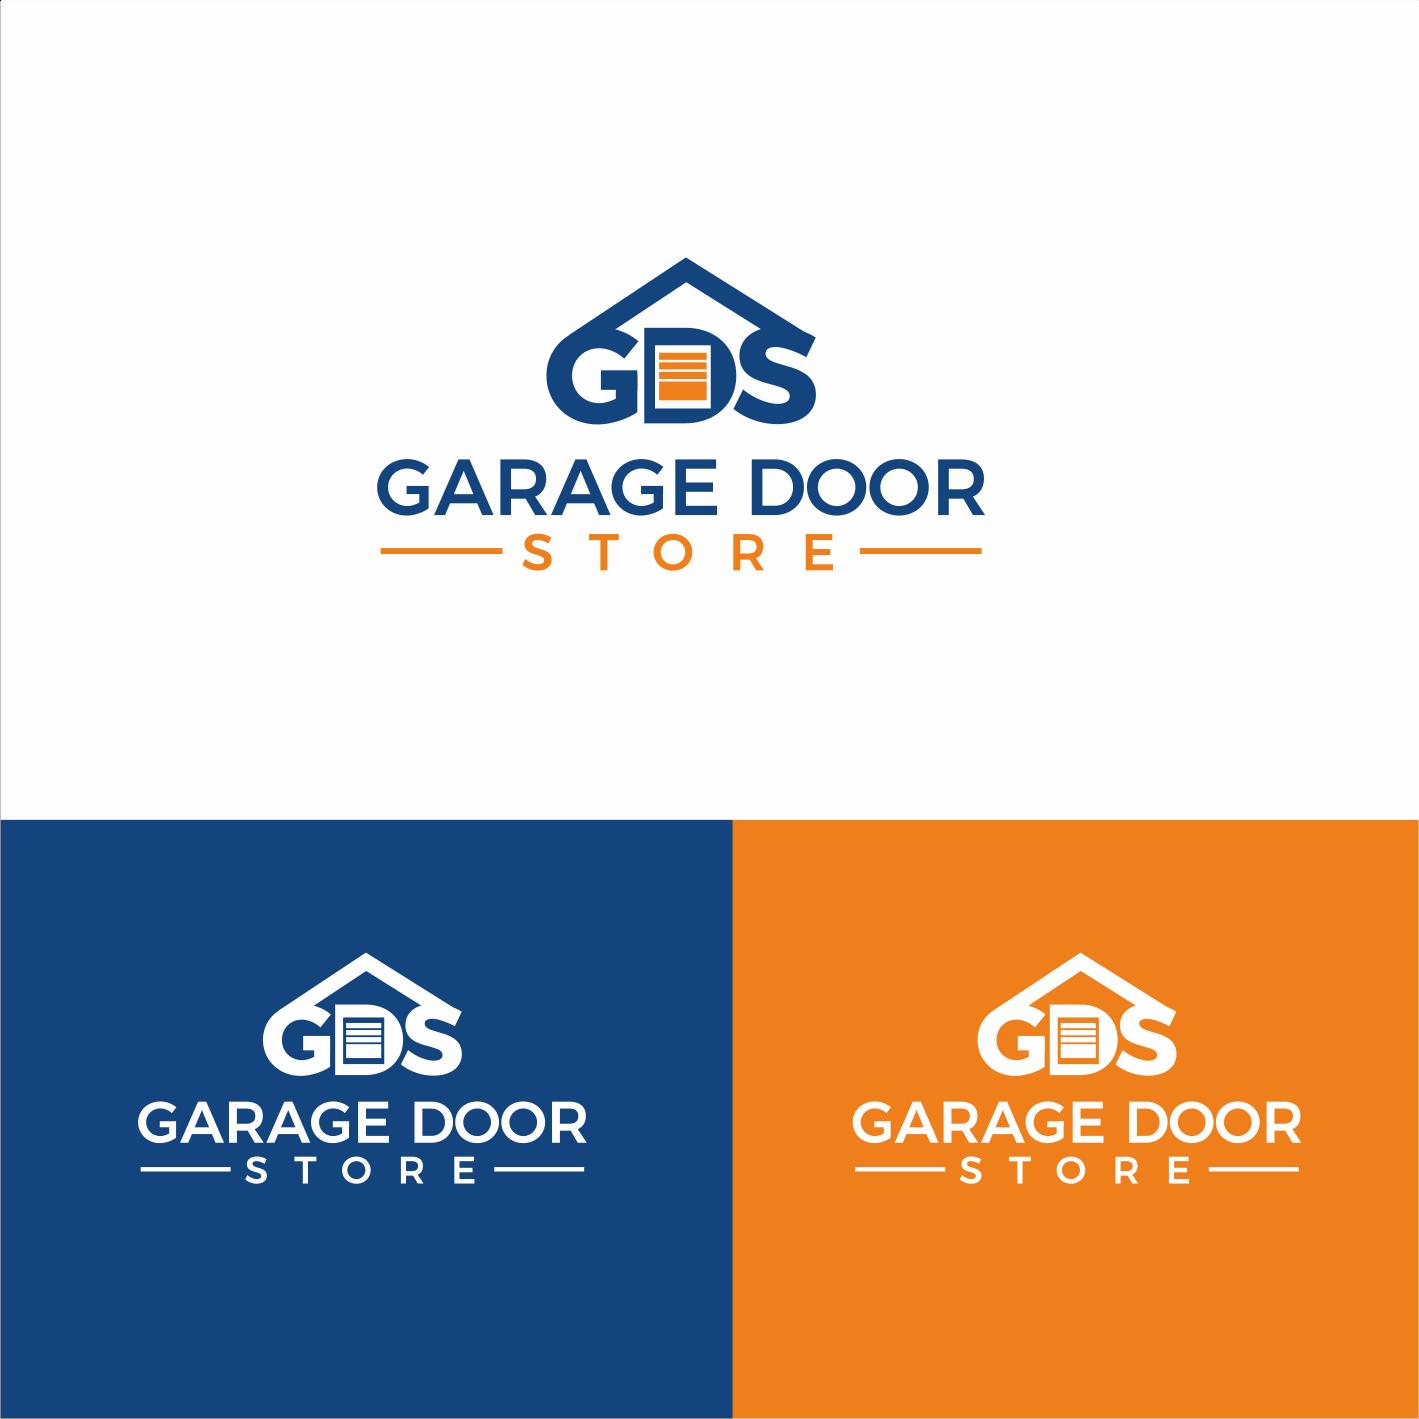 Logo Design For Garage Door Store By Creative Design 18738820